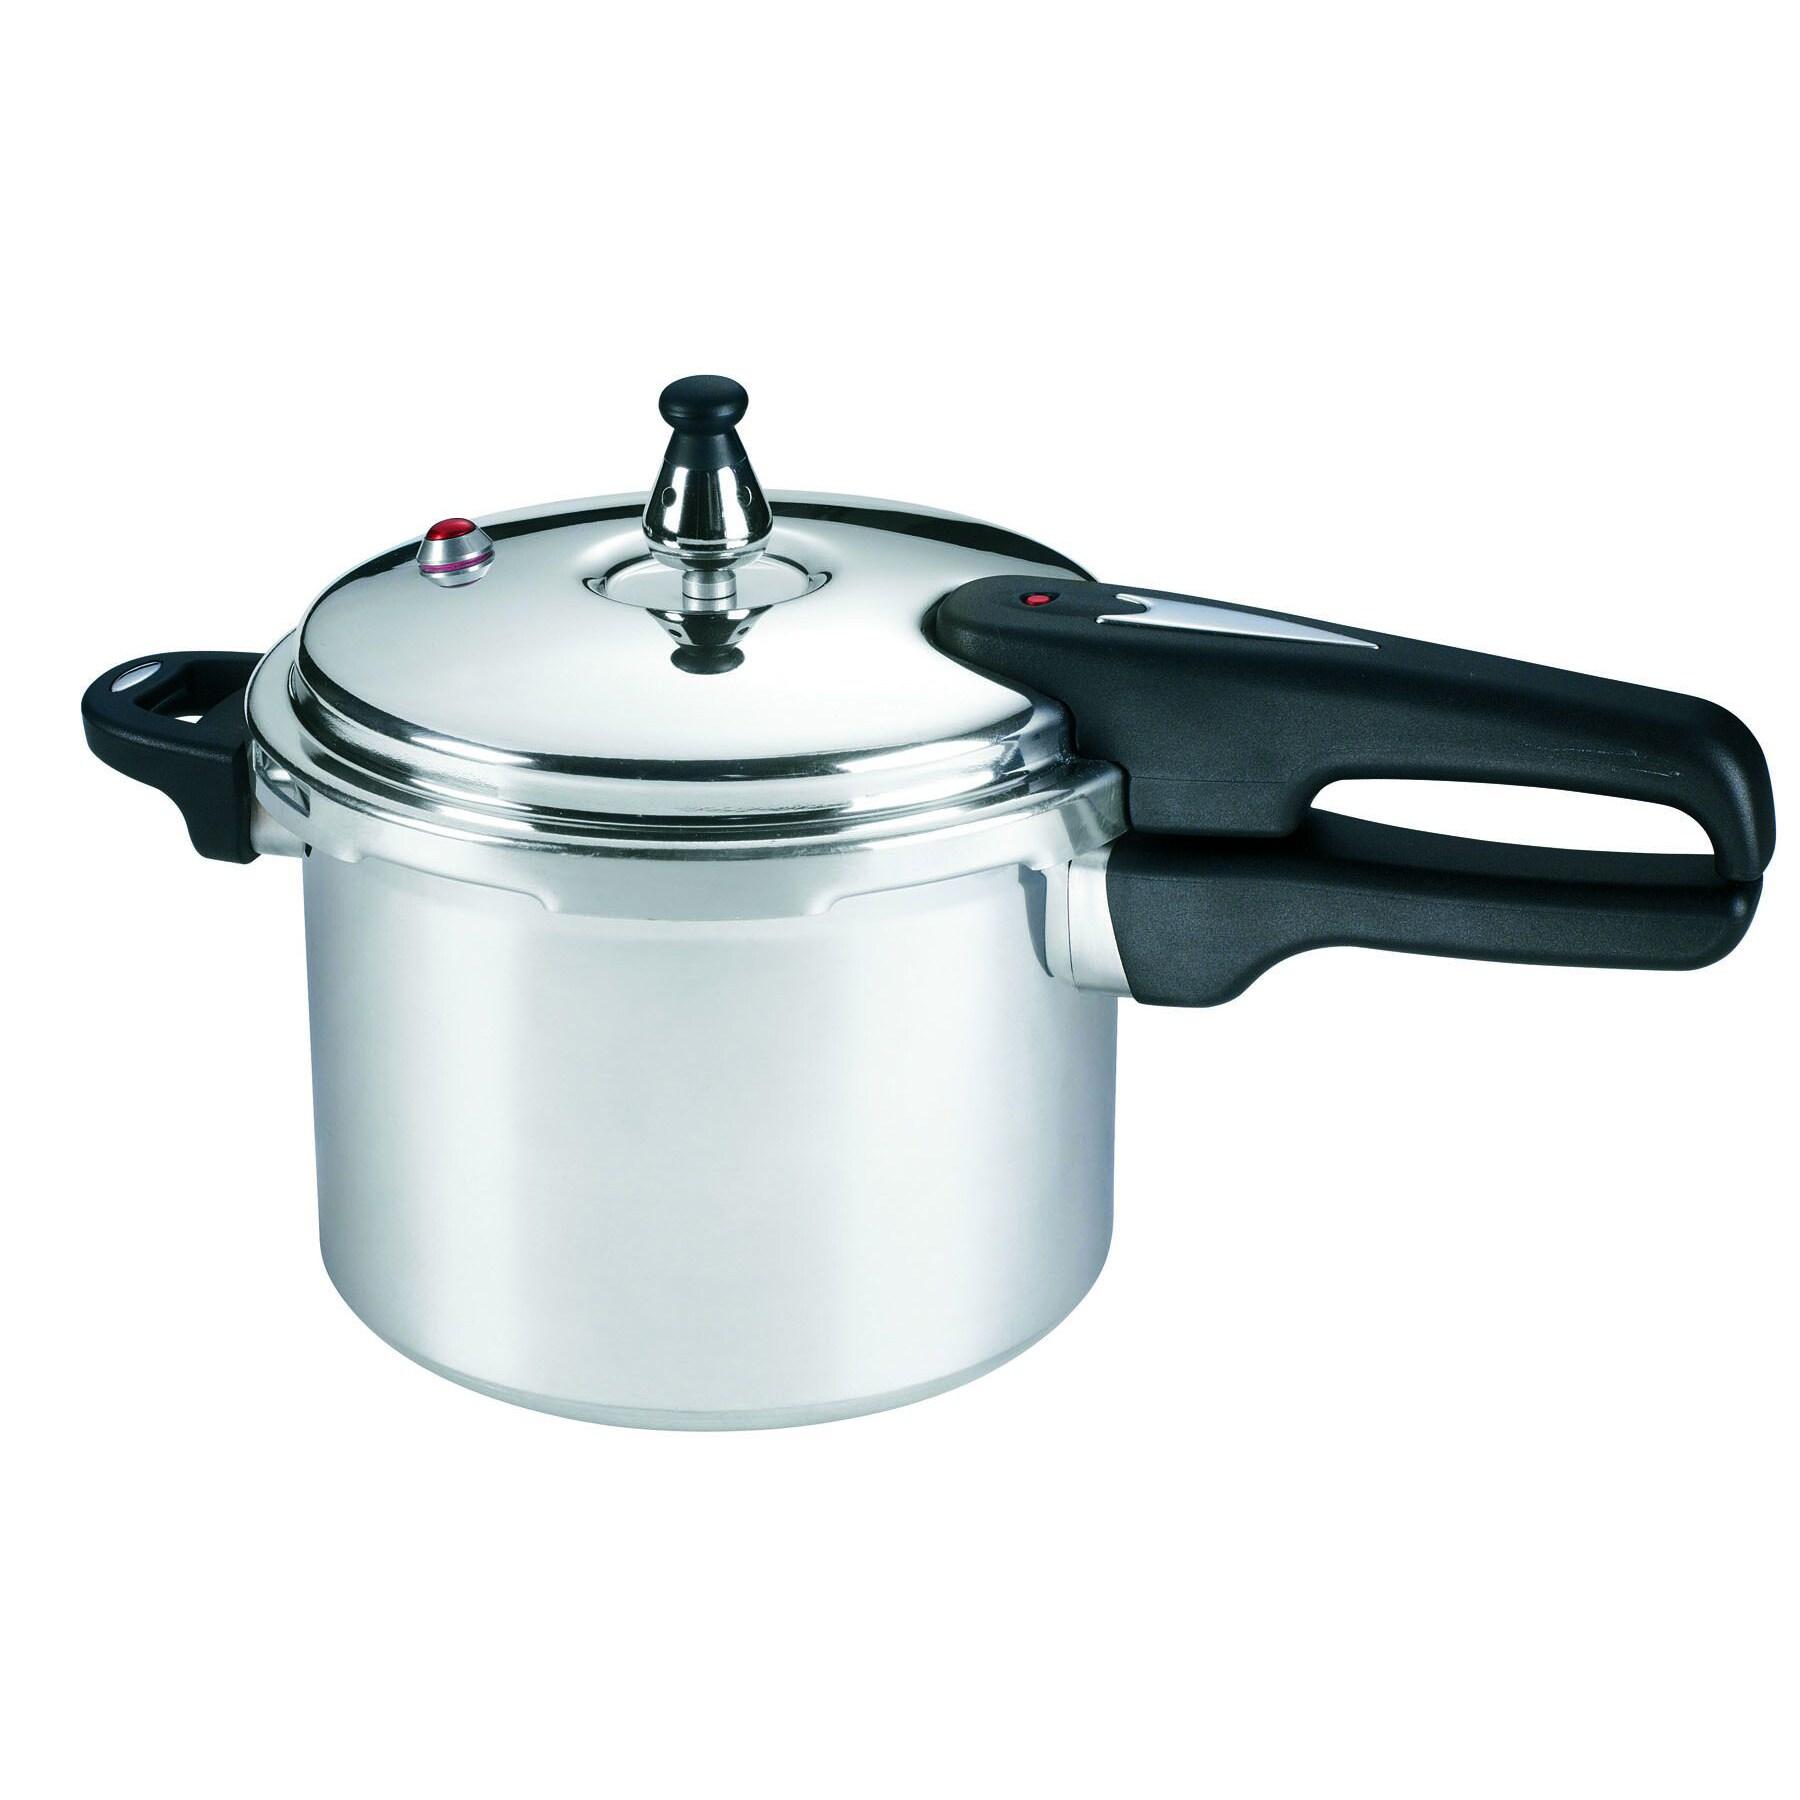 Mirro 4-quart Pressure Cooker (4qt Pressure Cooker), Silv...